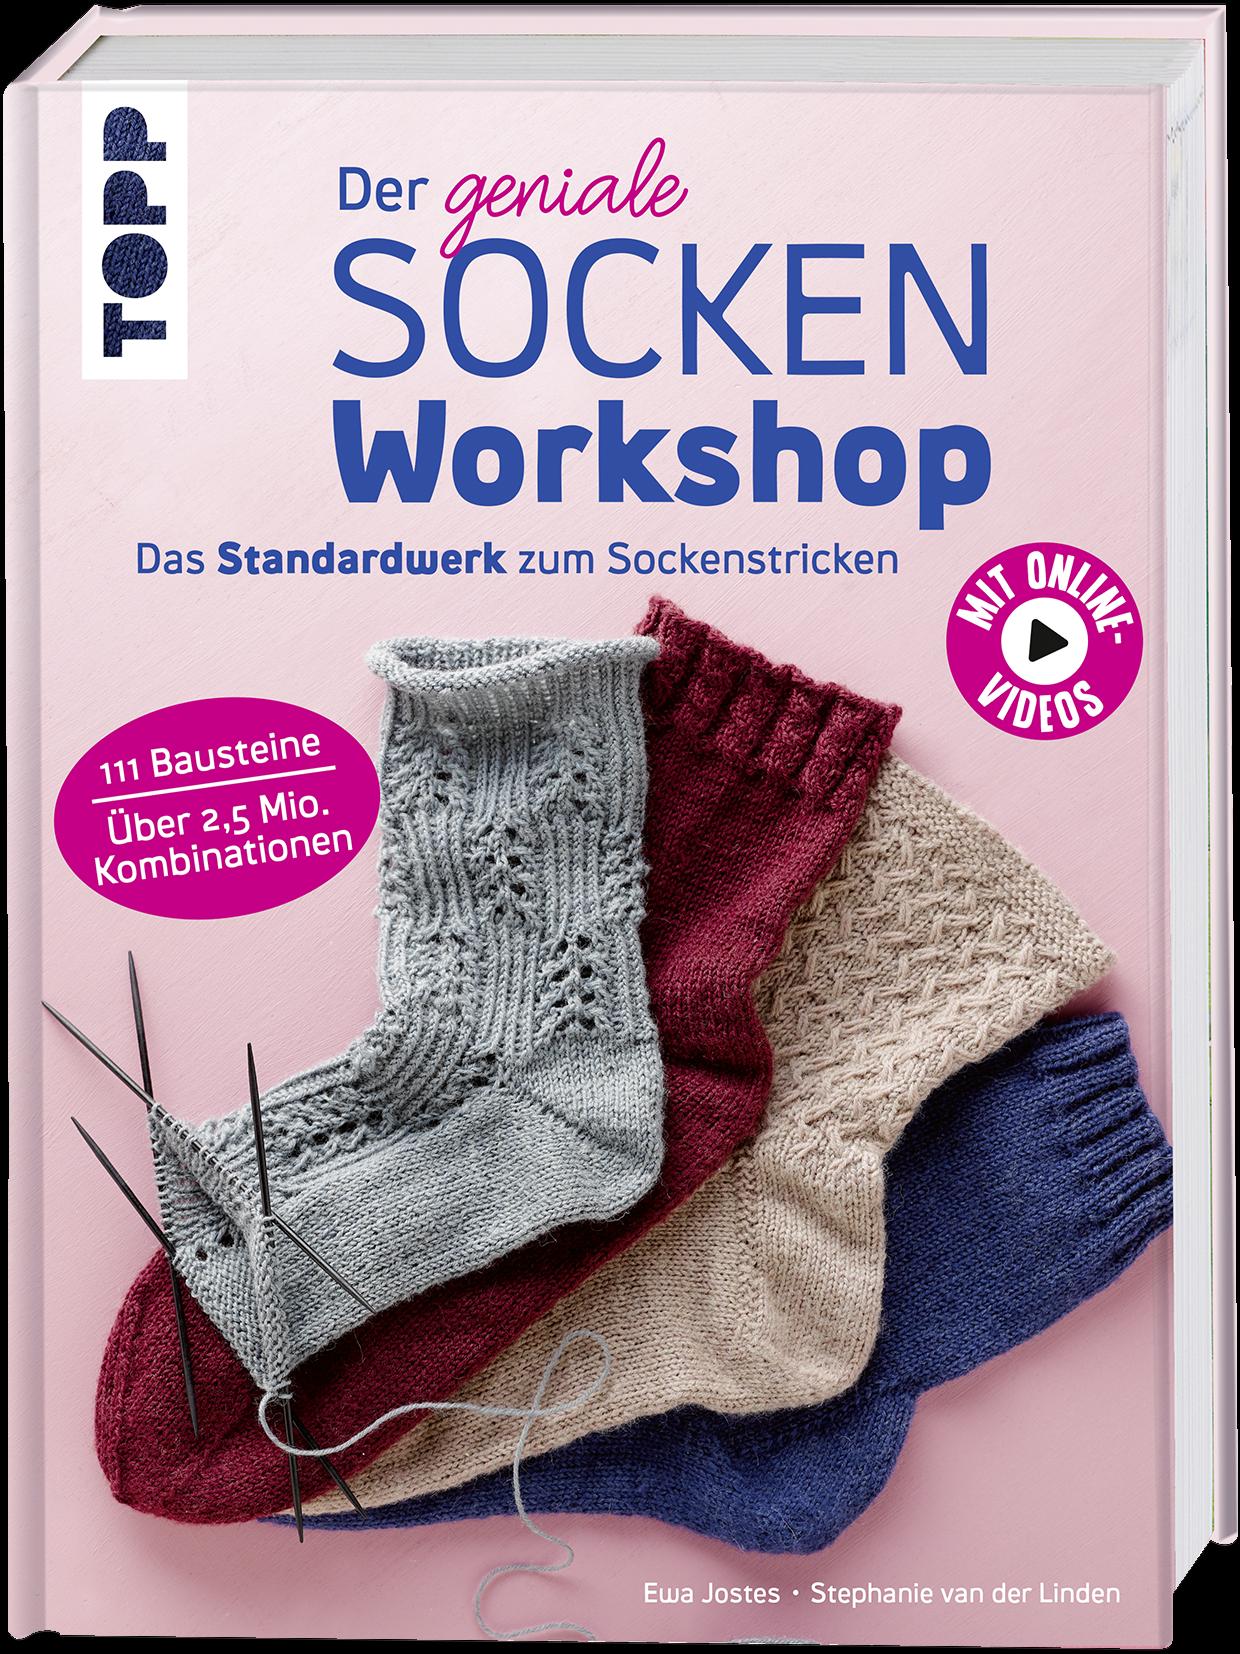 04.01.2019 – SWR Sendung Kaffee oder Tee: (dicke) Socken